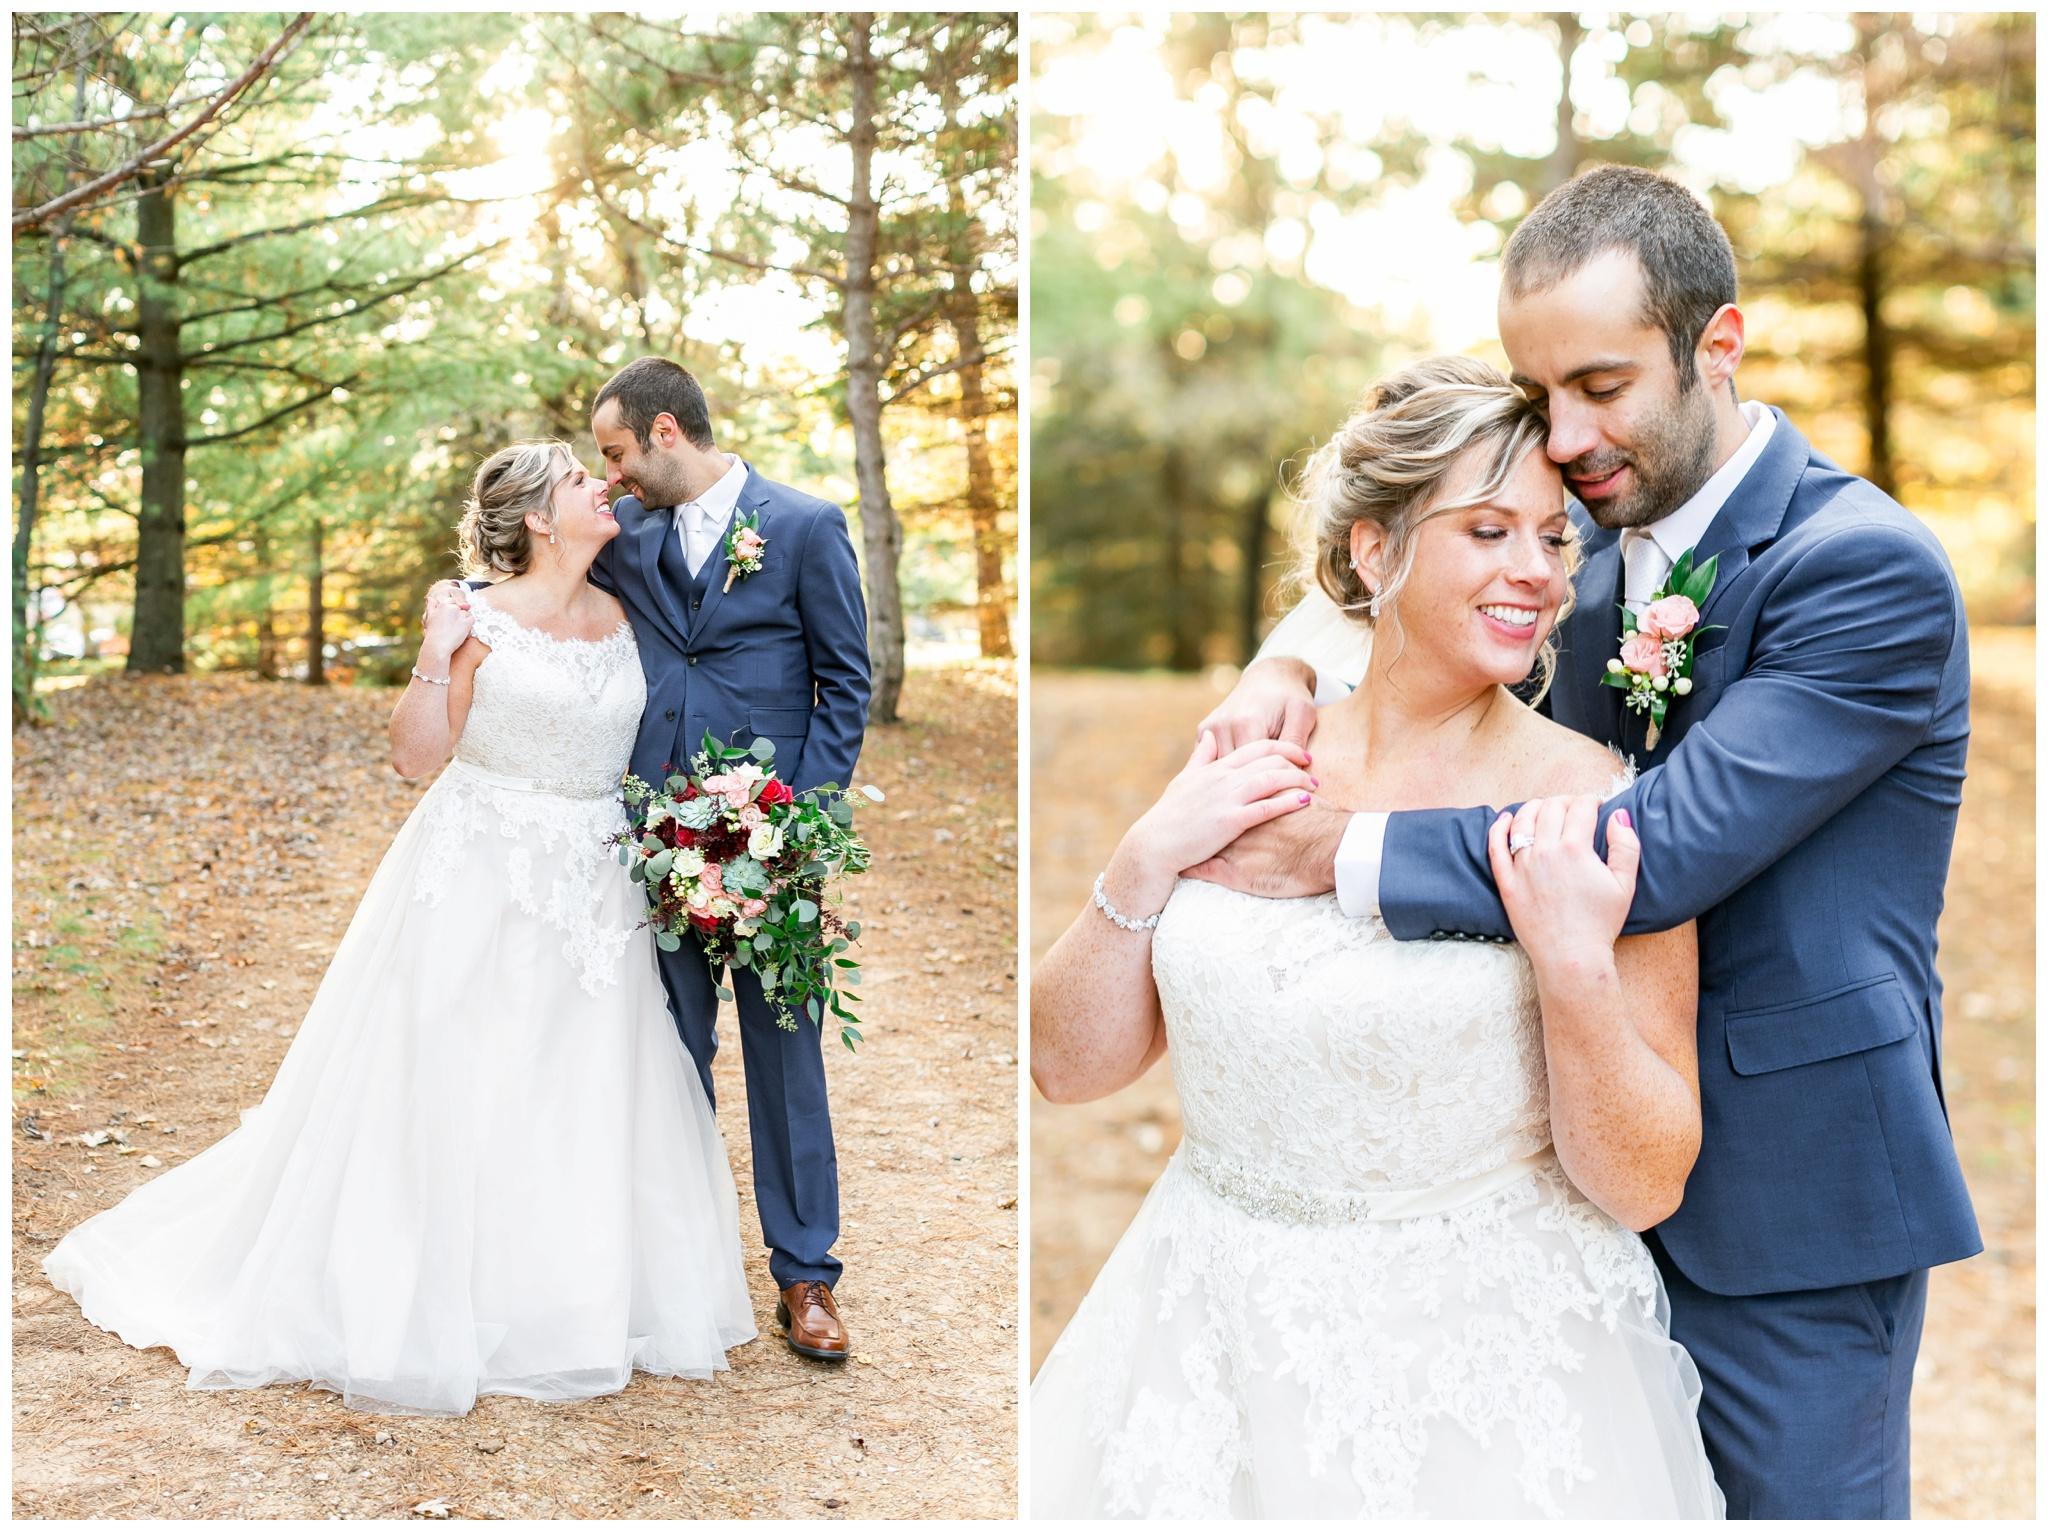 Shawano_County_park_Wedding_Caynay_Photo_Madison_Wi_2327.jpg